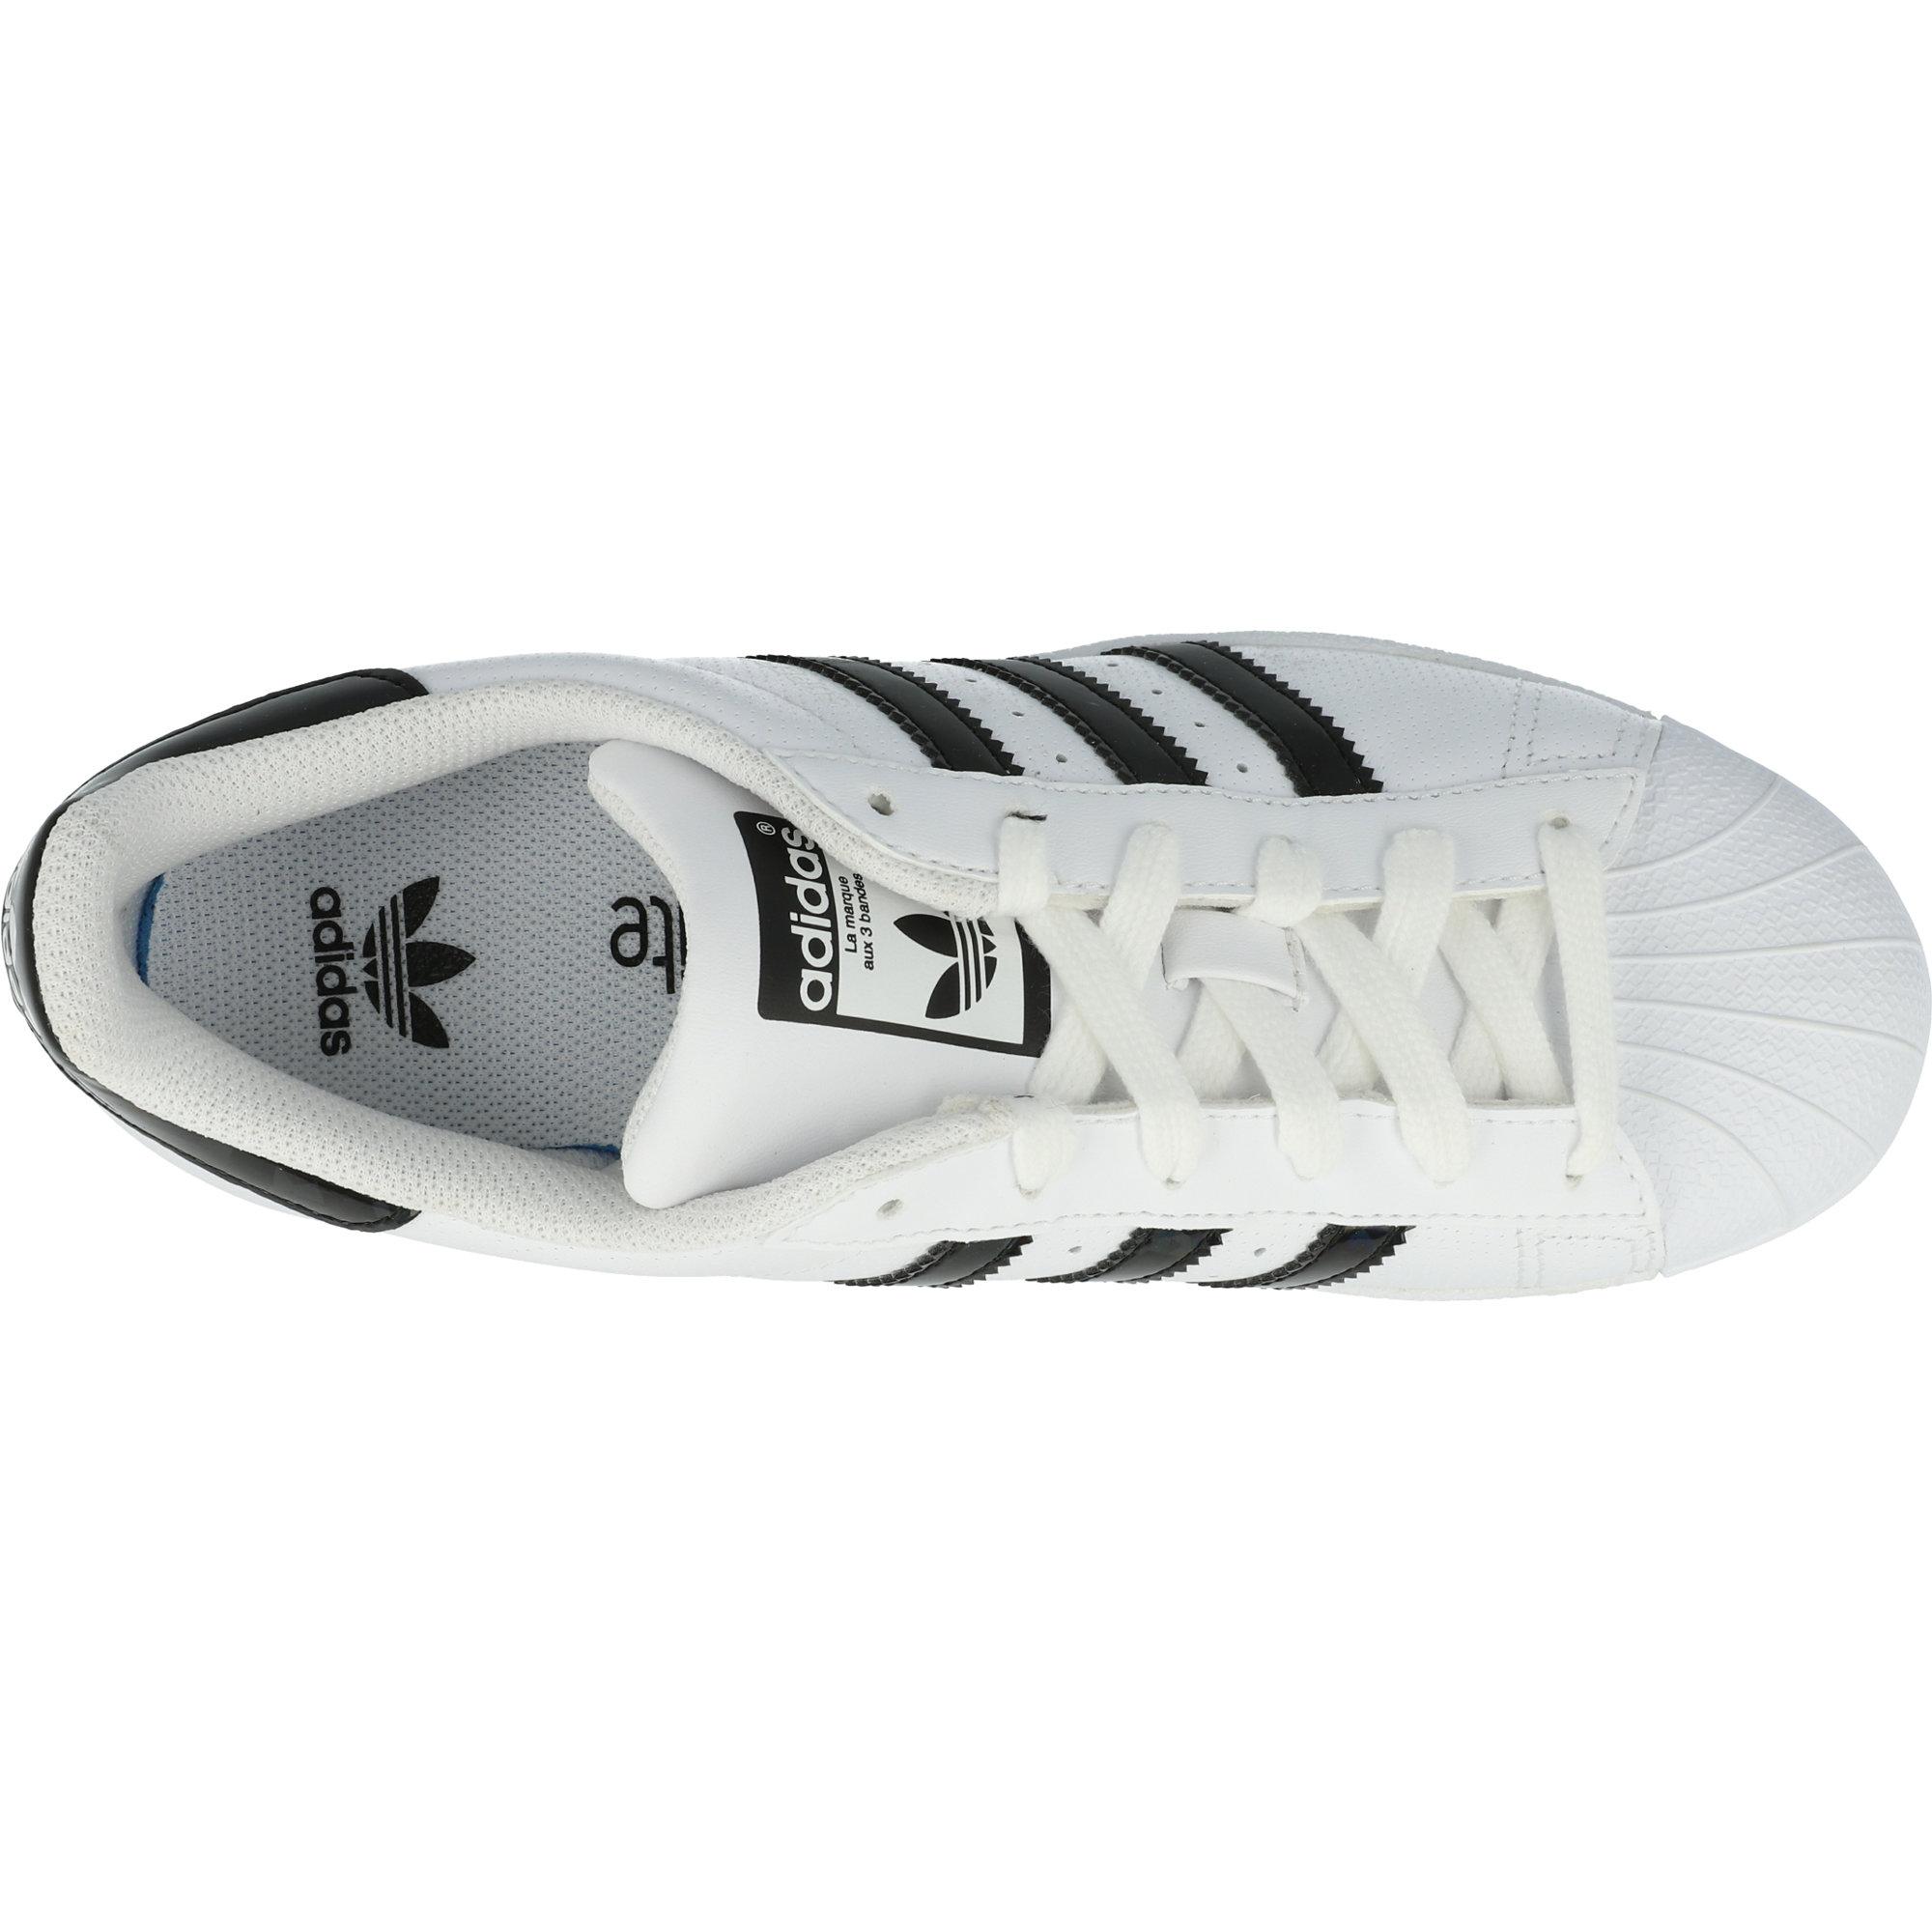 adidas Originals Superstar J WhiteBlack Holographic Leather Youth